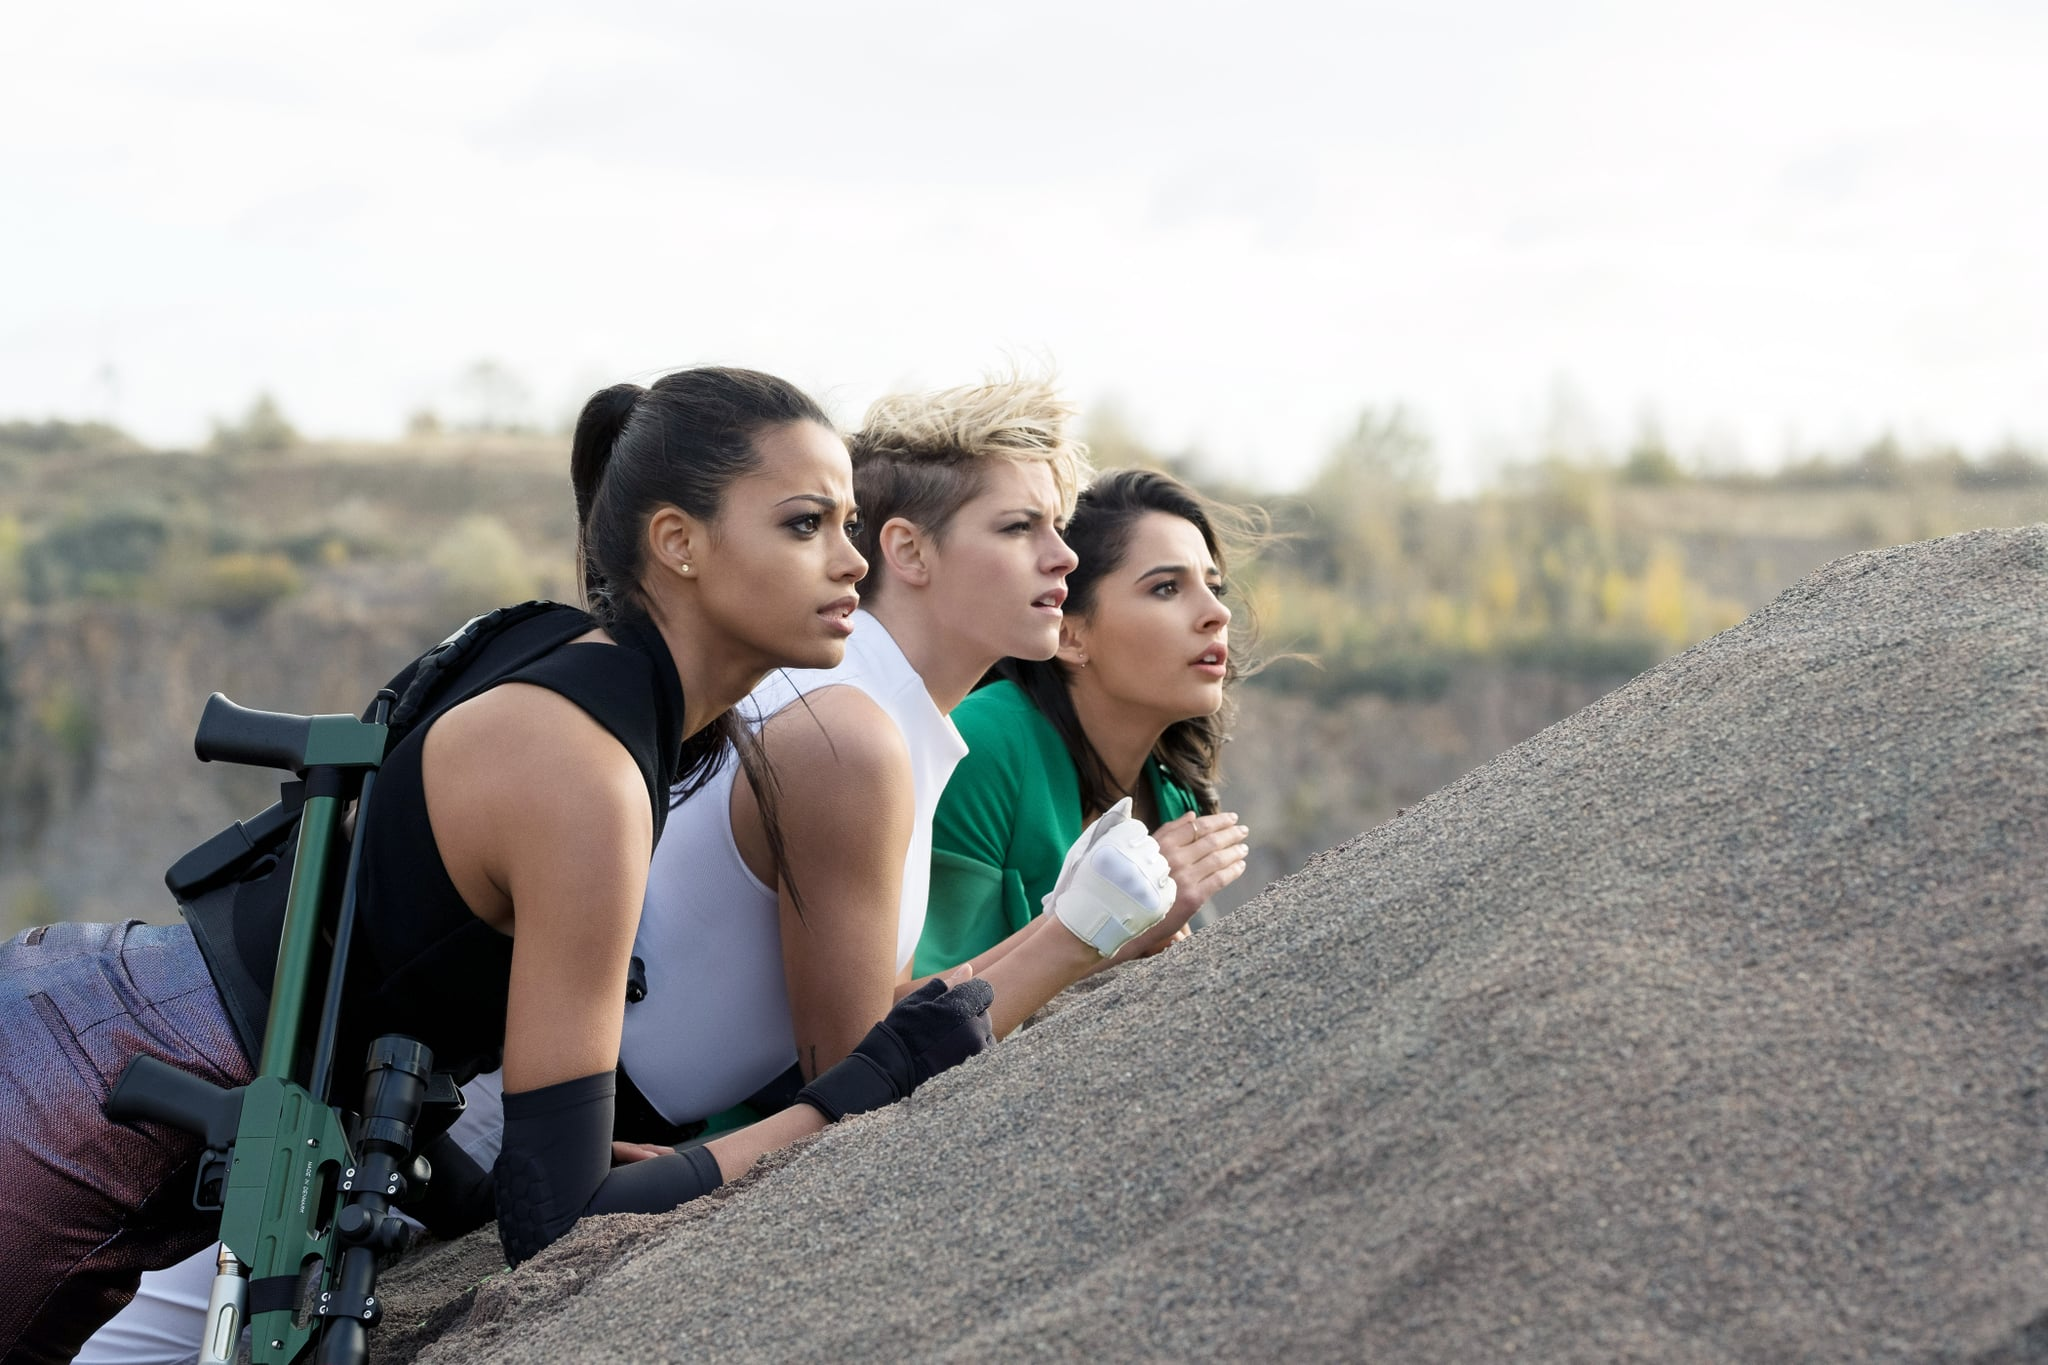 CHARLIE'S ANGELS, from left: Ella Balinska, Kristen Stewart, Naomi Scott, 2019. ph: Nadja Klier /  Columbia / courtesy Everett Collection